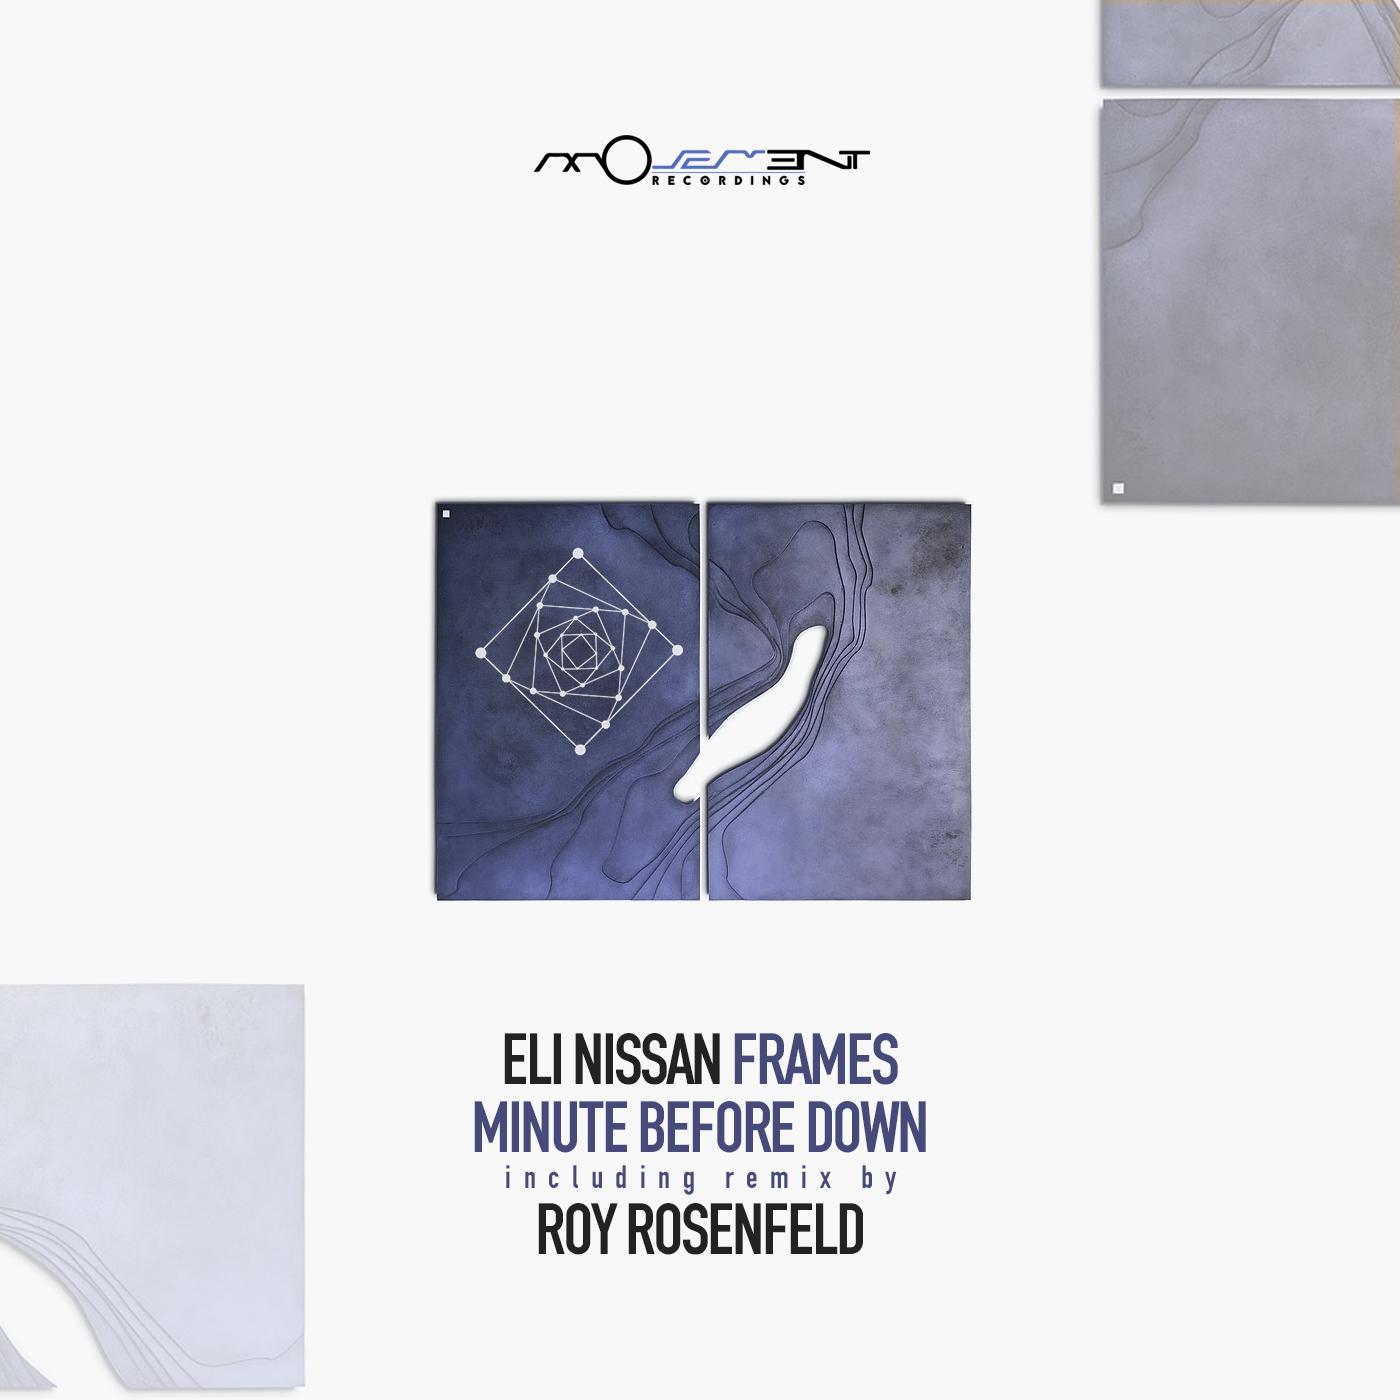 Eli Nissan - Frames (Movement Recordings)